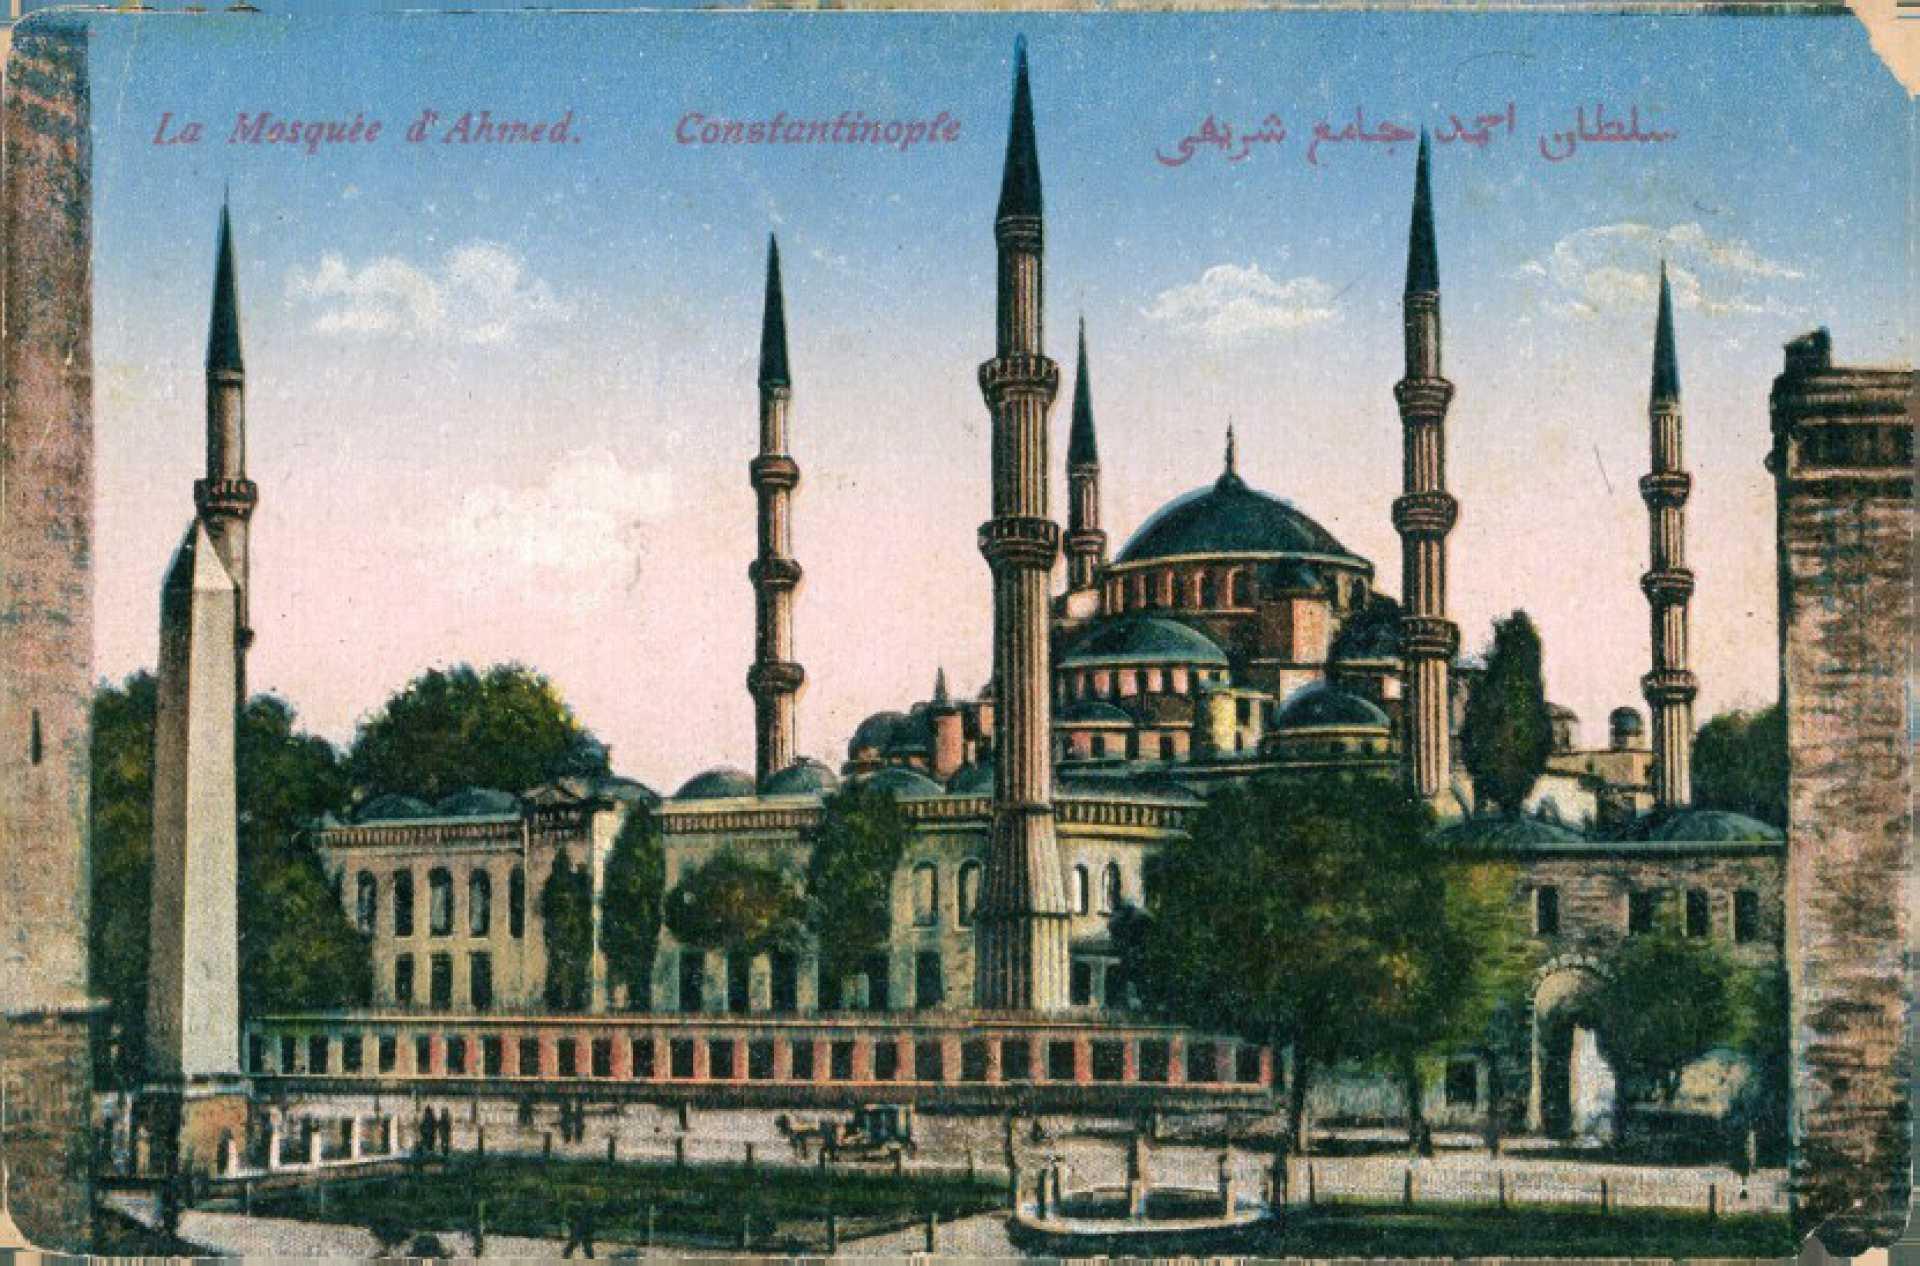 La Mosquée d'Ahmed. Costantinople